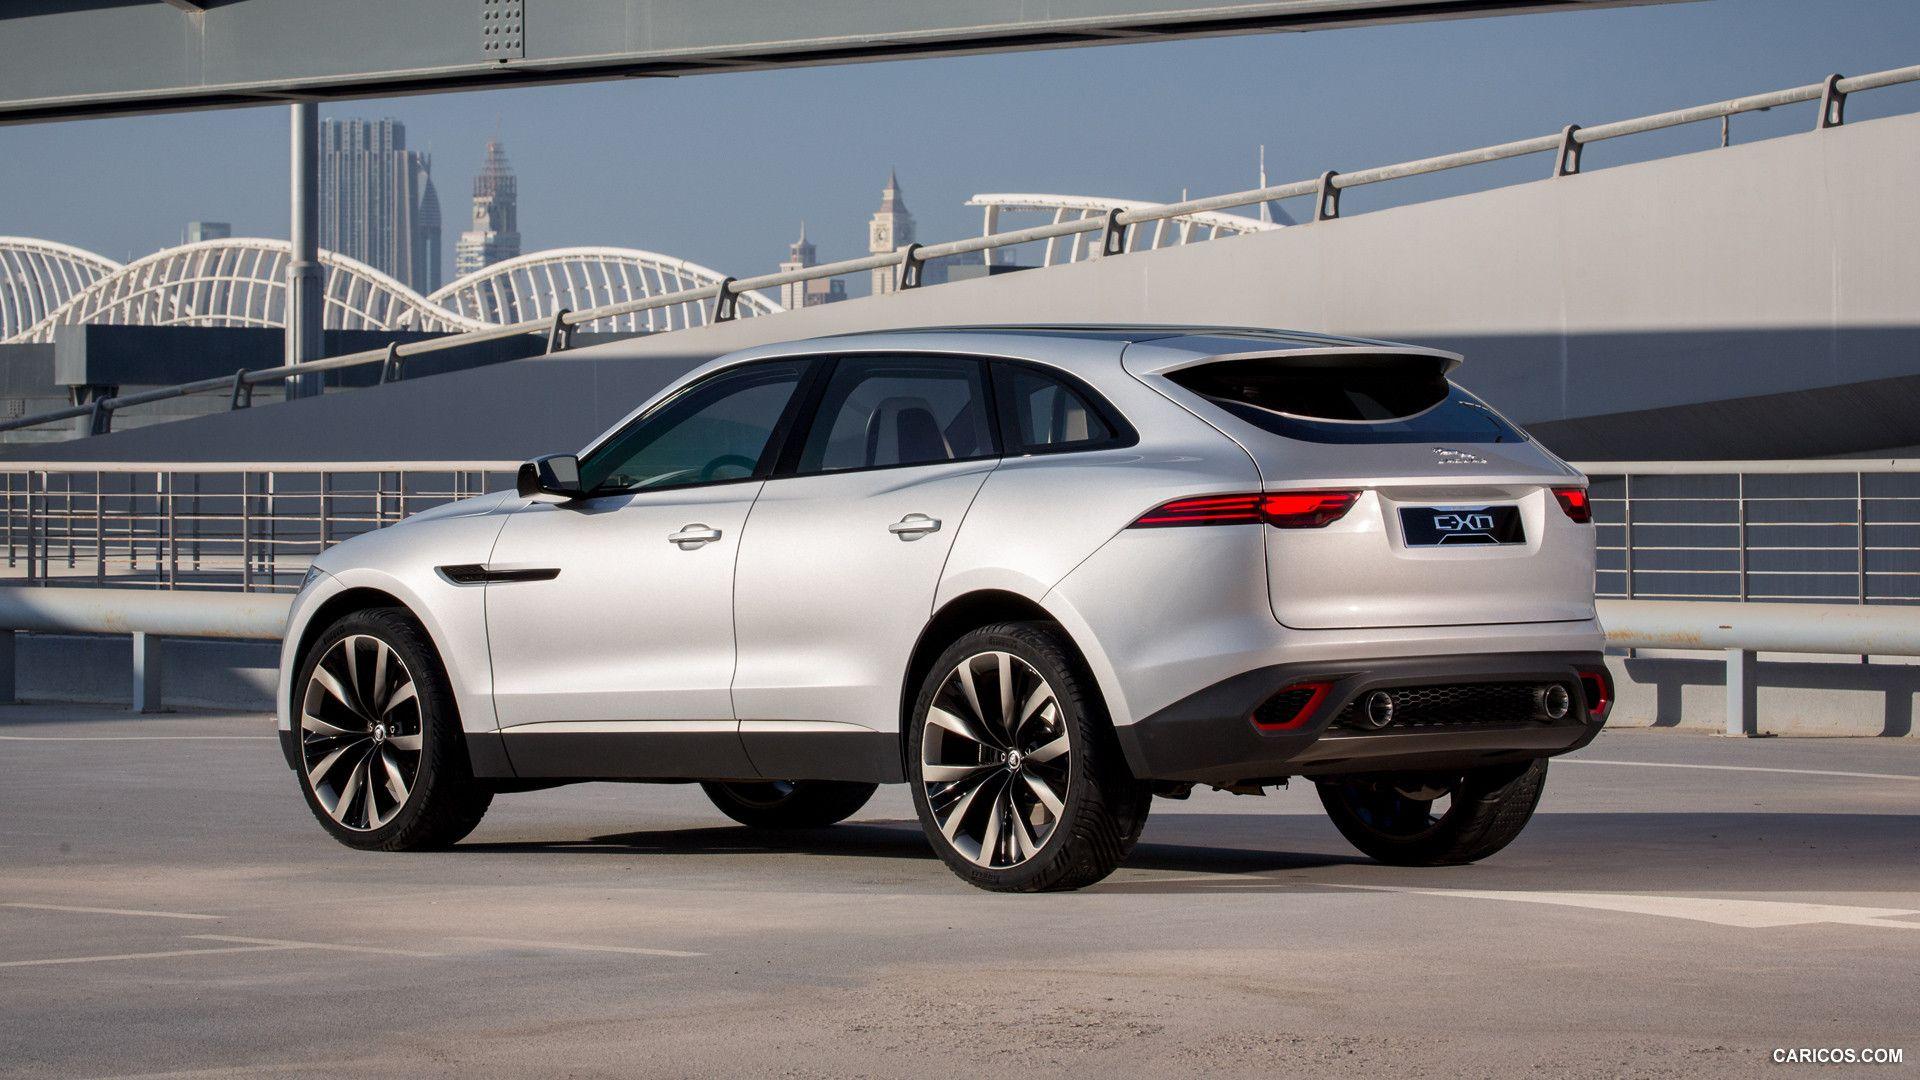 2016 Jaguar F Pace Suv Hybrid Jaguar Jaguar Suv Jaguar Cars